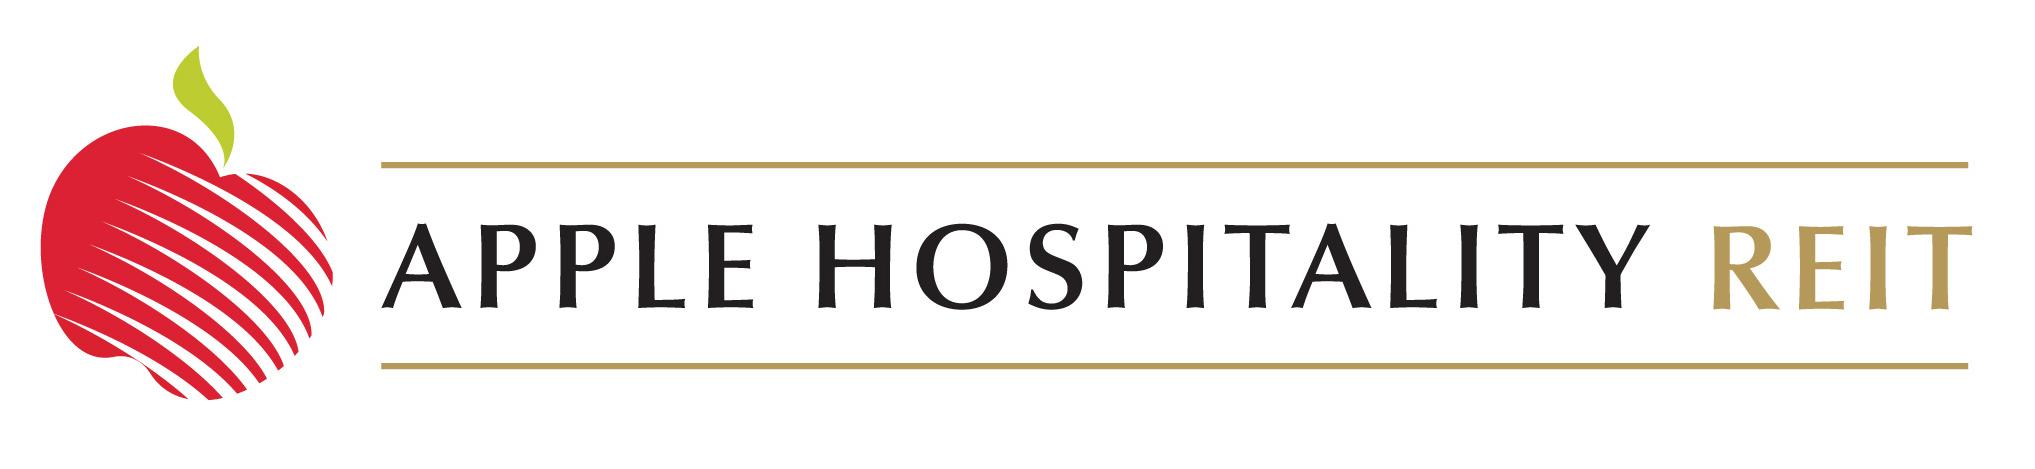 Apple Hospitality REIT, Inc. Company Logo